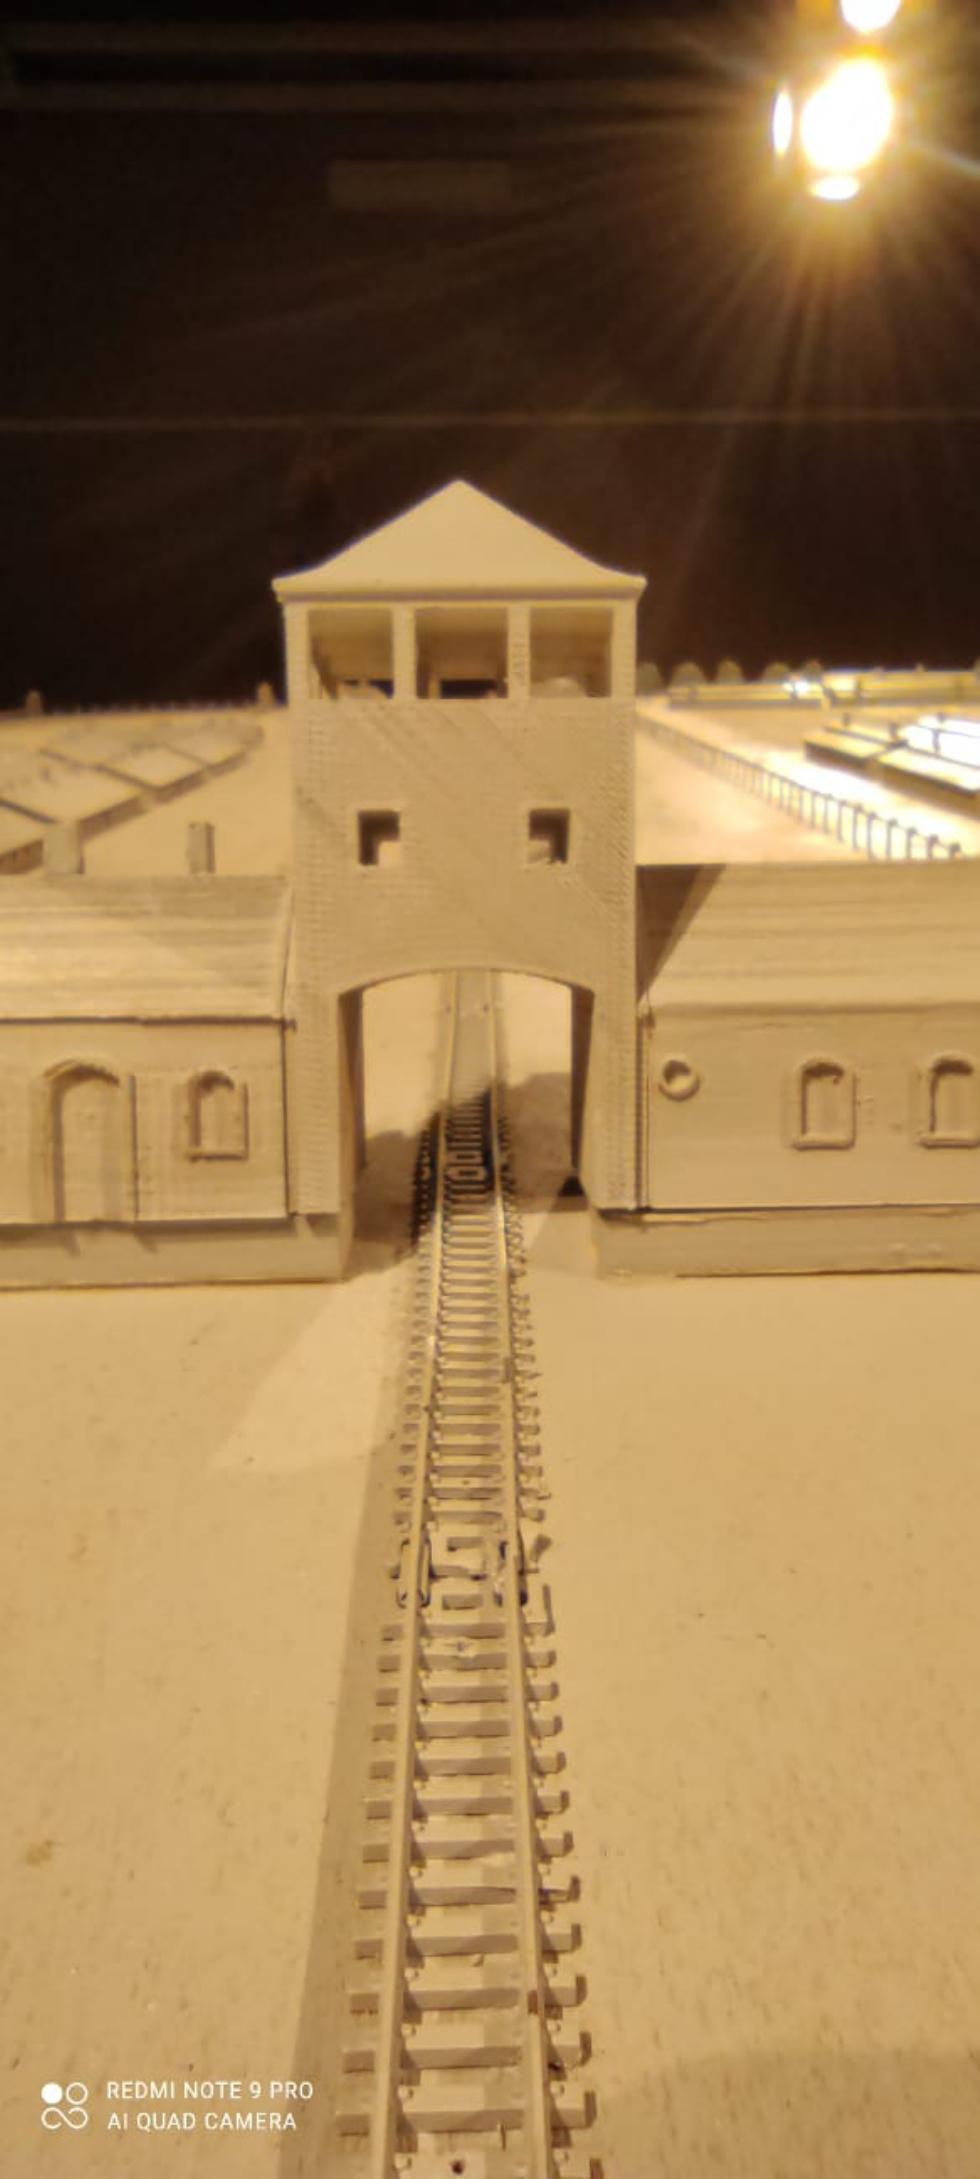 VENARIA - «Dentro Auschwitz»: Retroscena, Biblioteca e 296 Model ricordano quel dramma